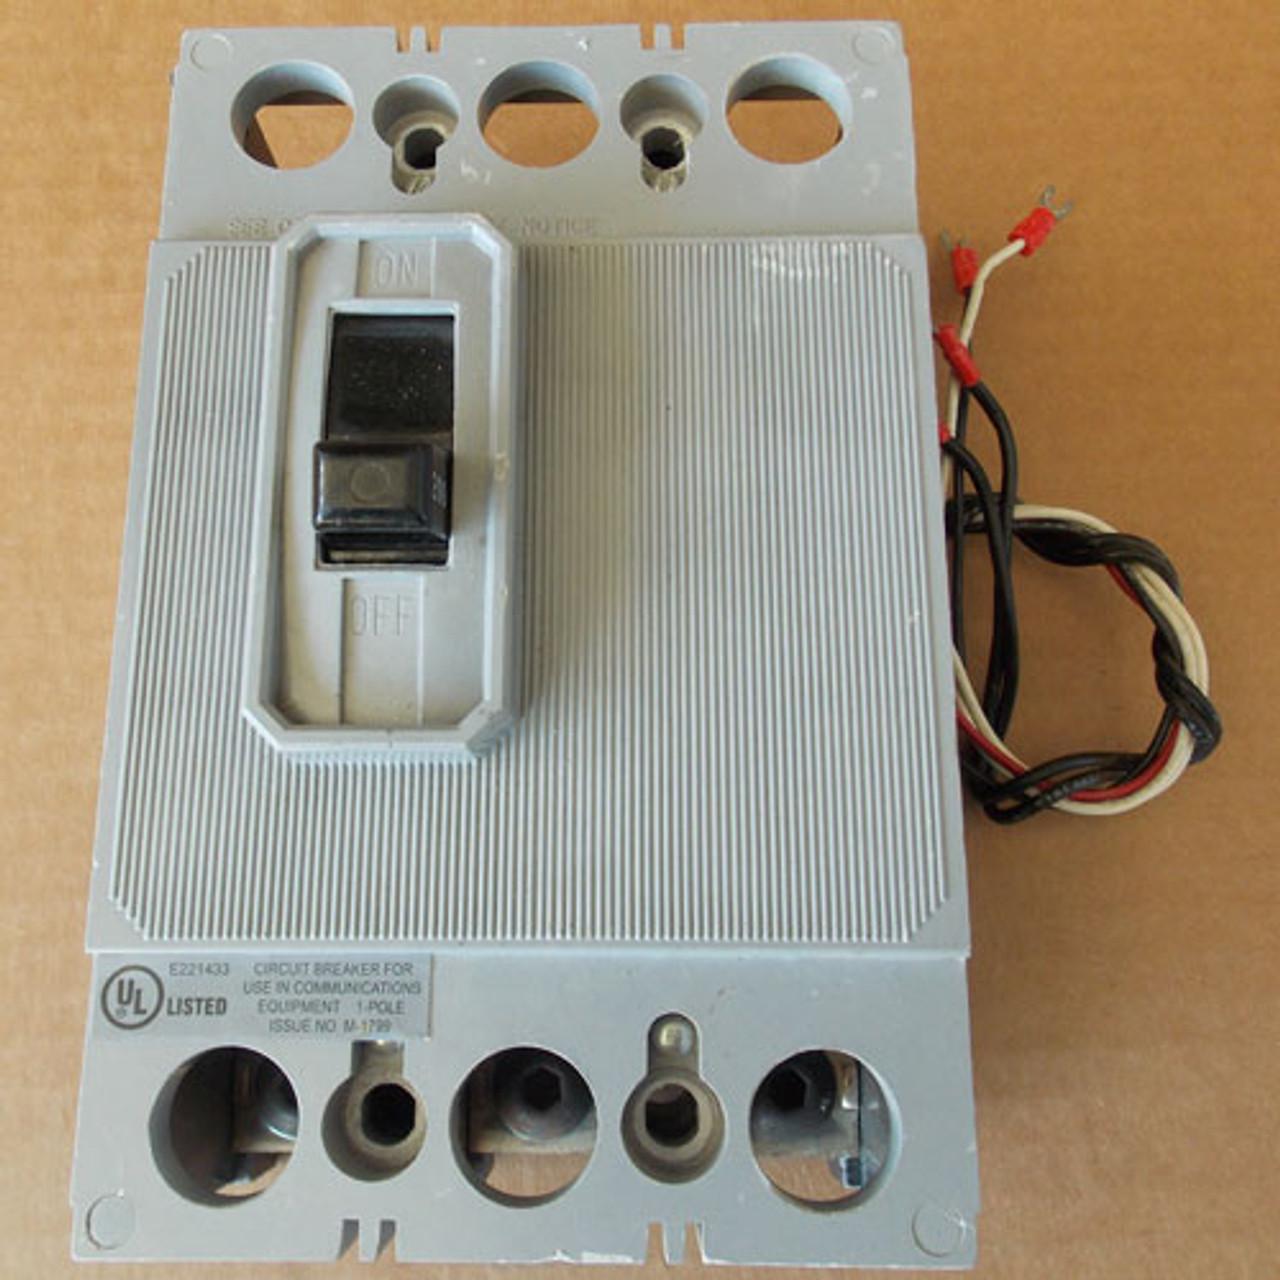 Electric Equipment EEQB200 3 Pole 600 Amp 80 VDC Circuit Breaker - Used